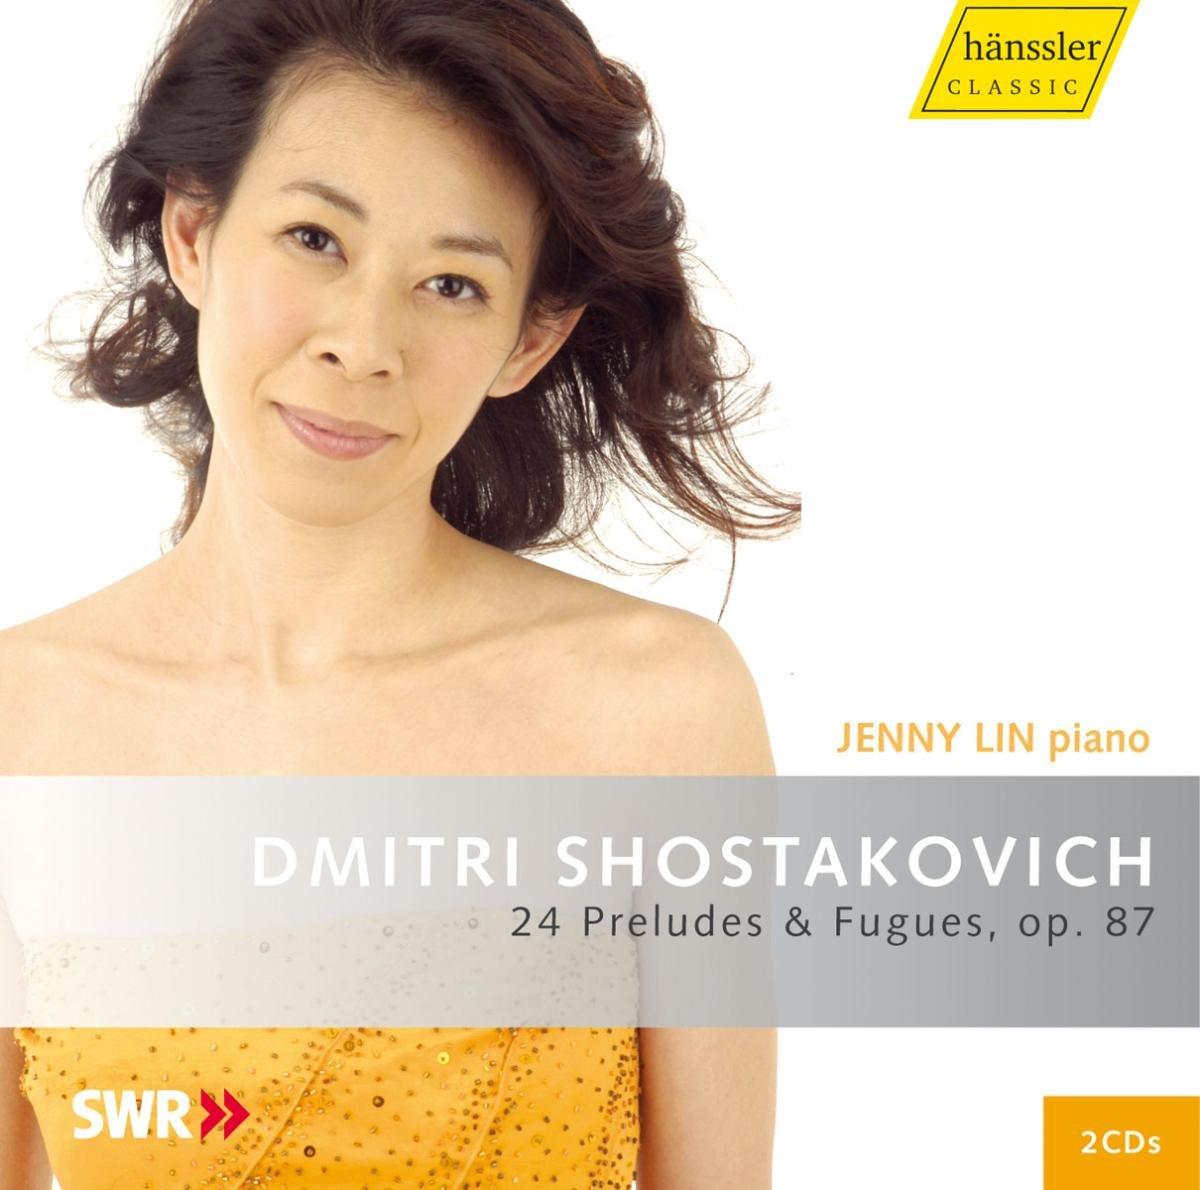 Shostakovich: 24 Preludes & Fugues, Op. 87 by Haenssler Classics